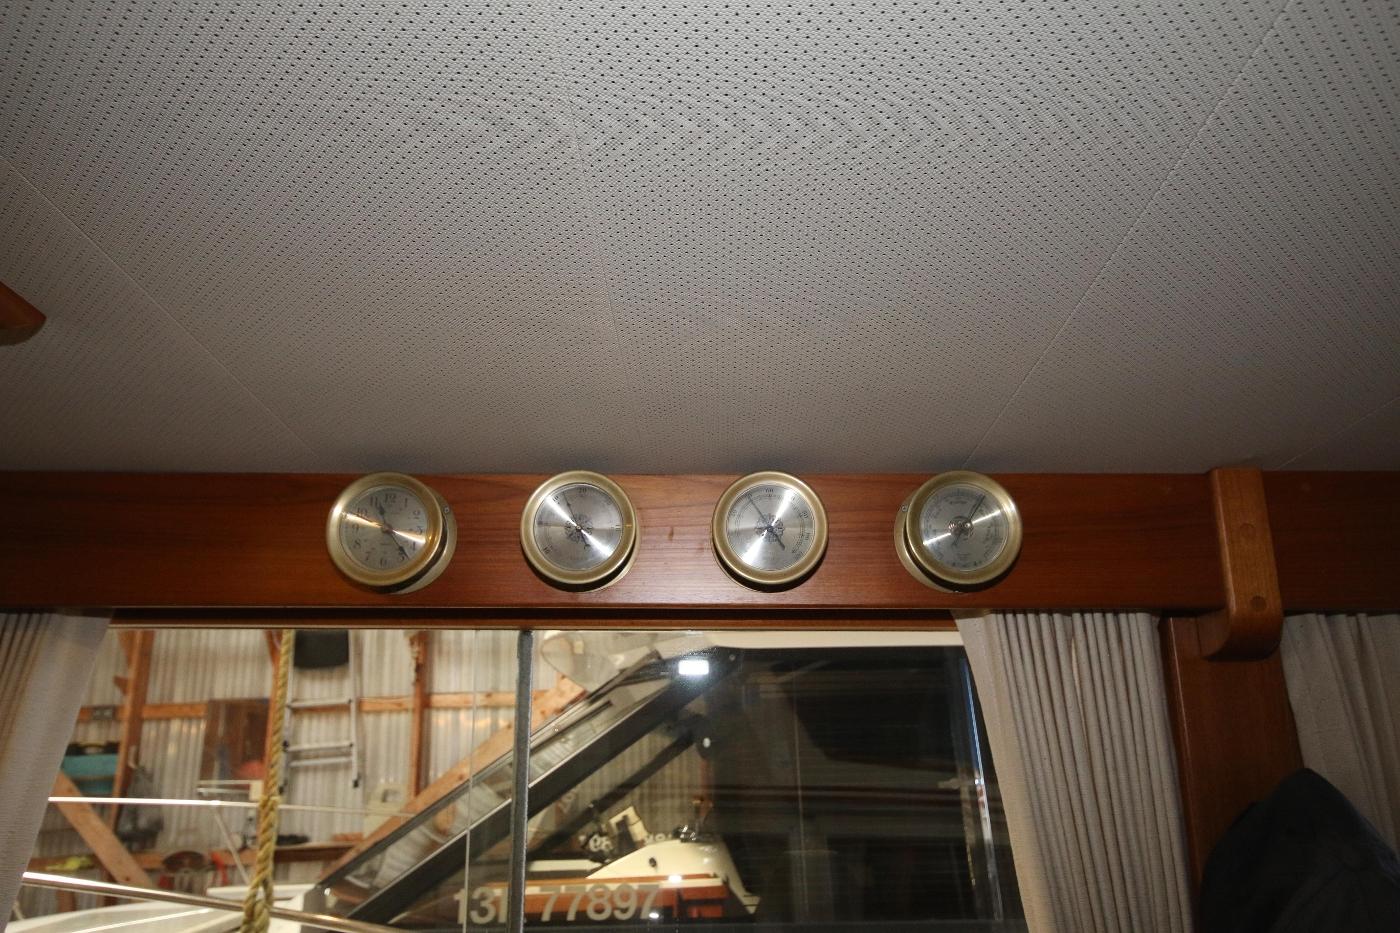 1988 Grand Banks 32, Clock, Barometer, Thermo & Hygro